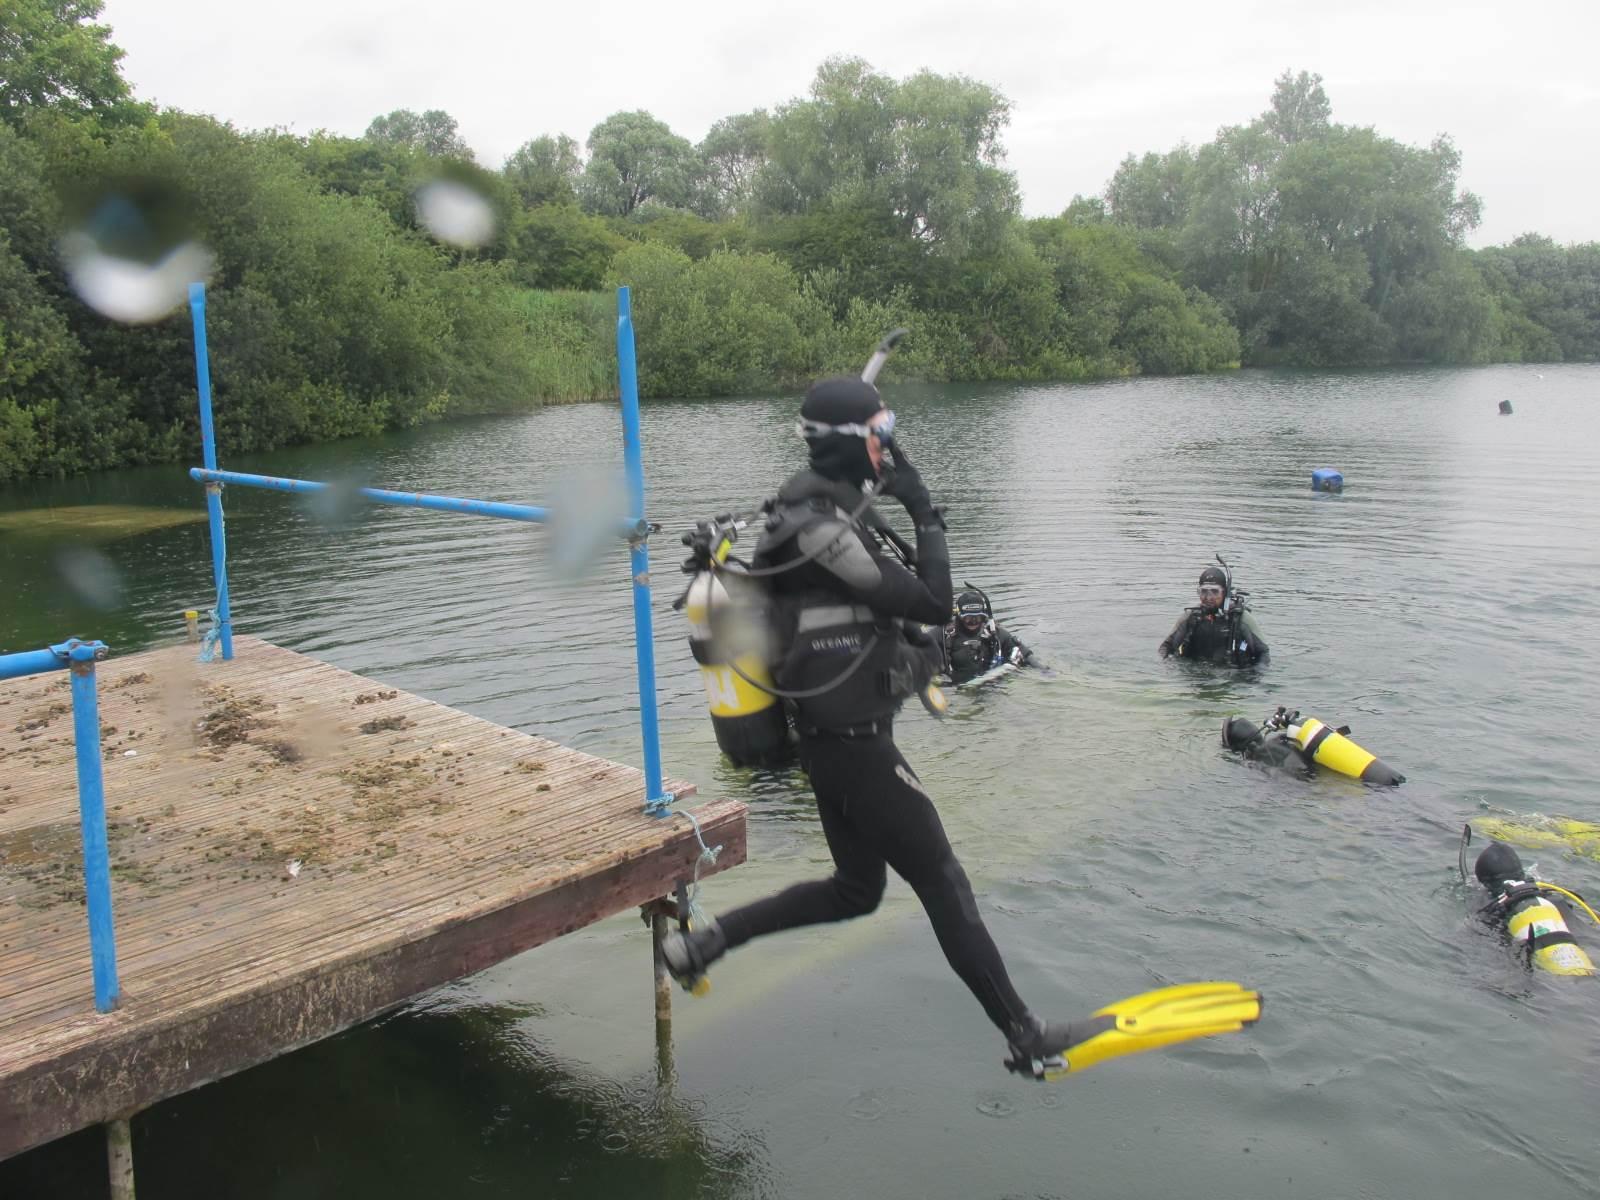 PADI open water scuba diving course training in Cambridge